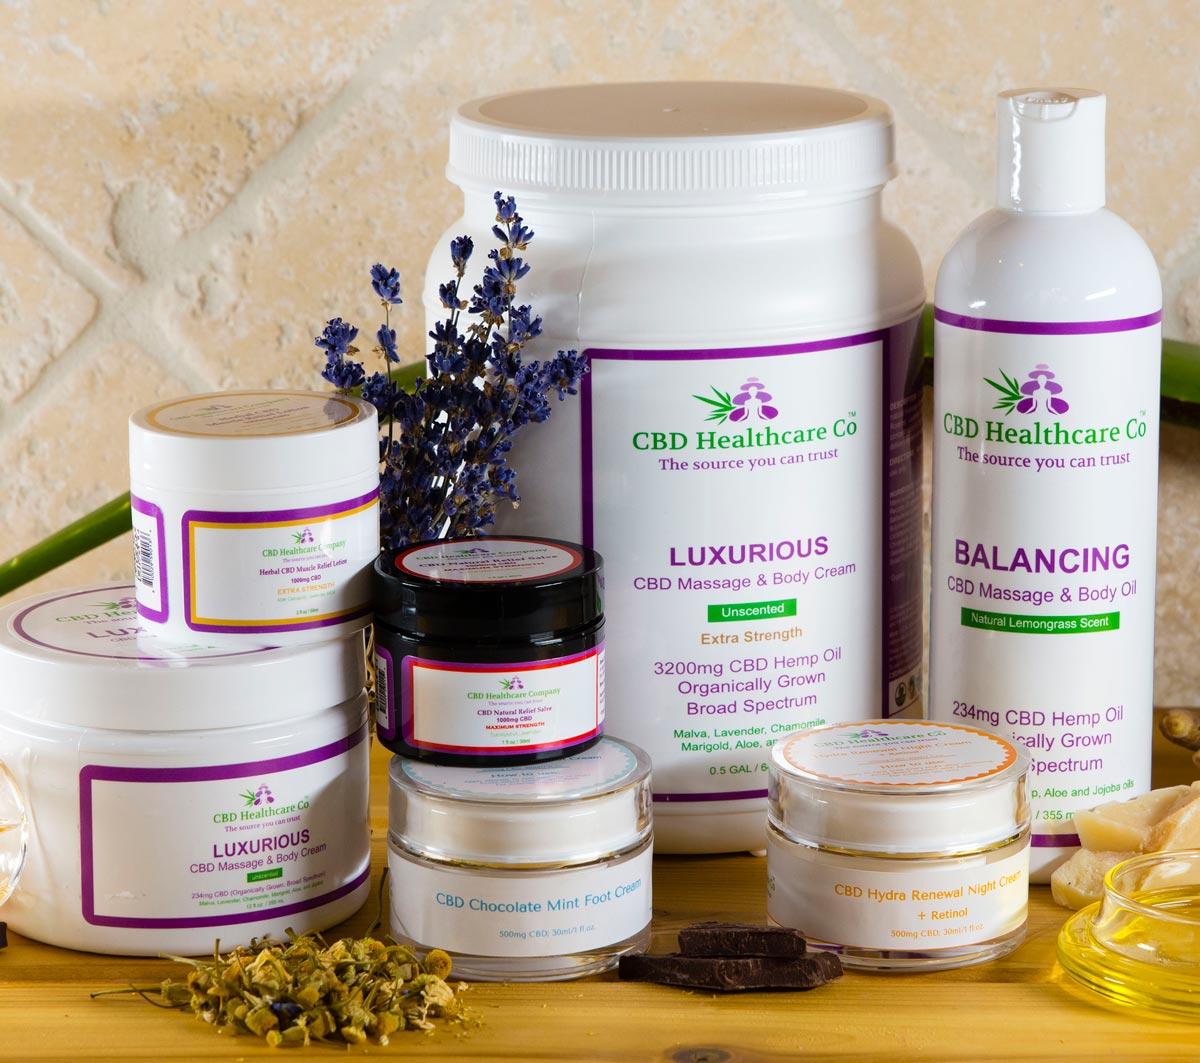 CBD Healthcare Company products